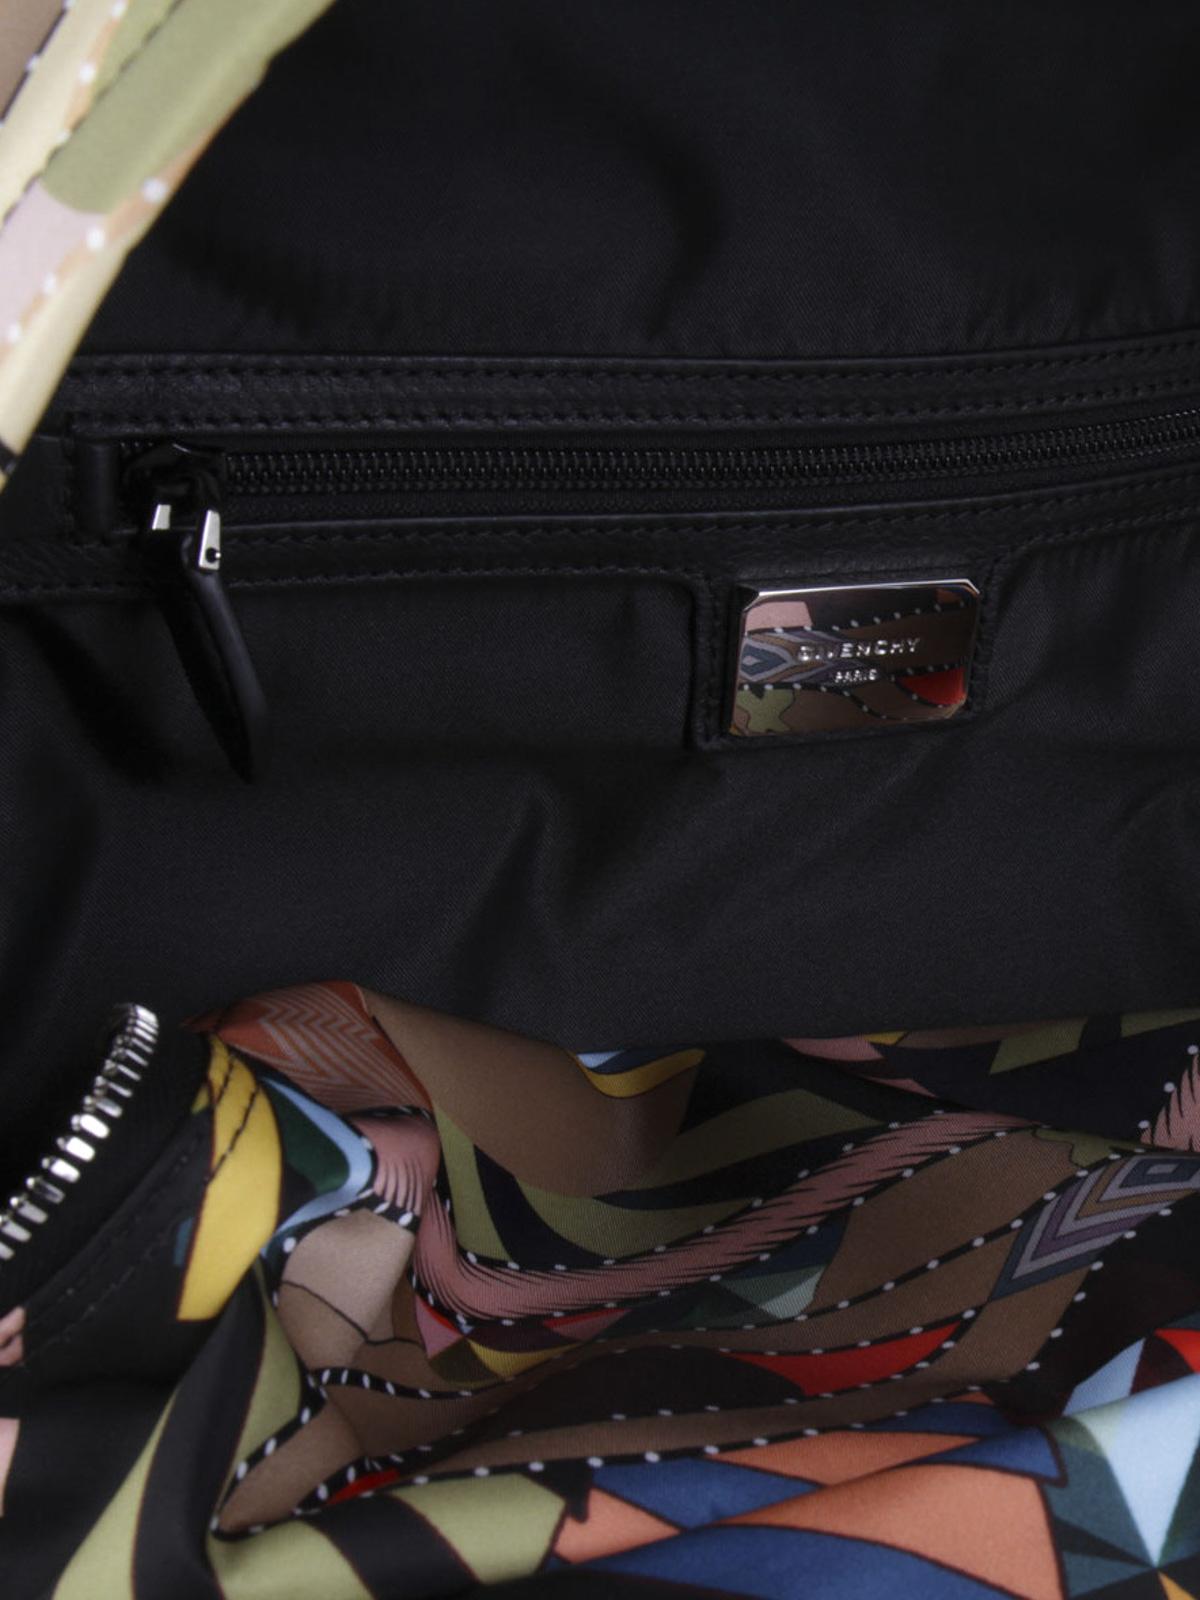 e010c3accc Givenchy - Crazy Cleopatra nylon backpack - backpacks - BJ05764196 960